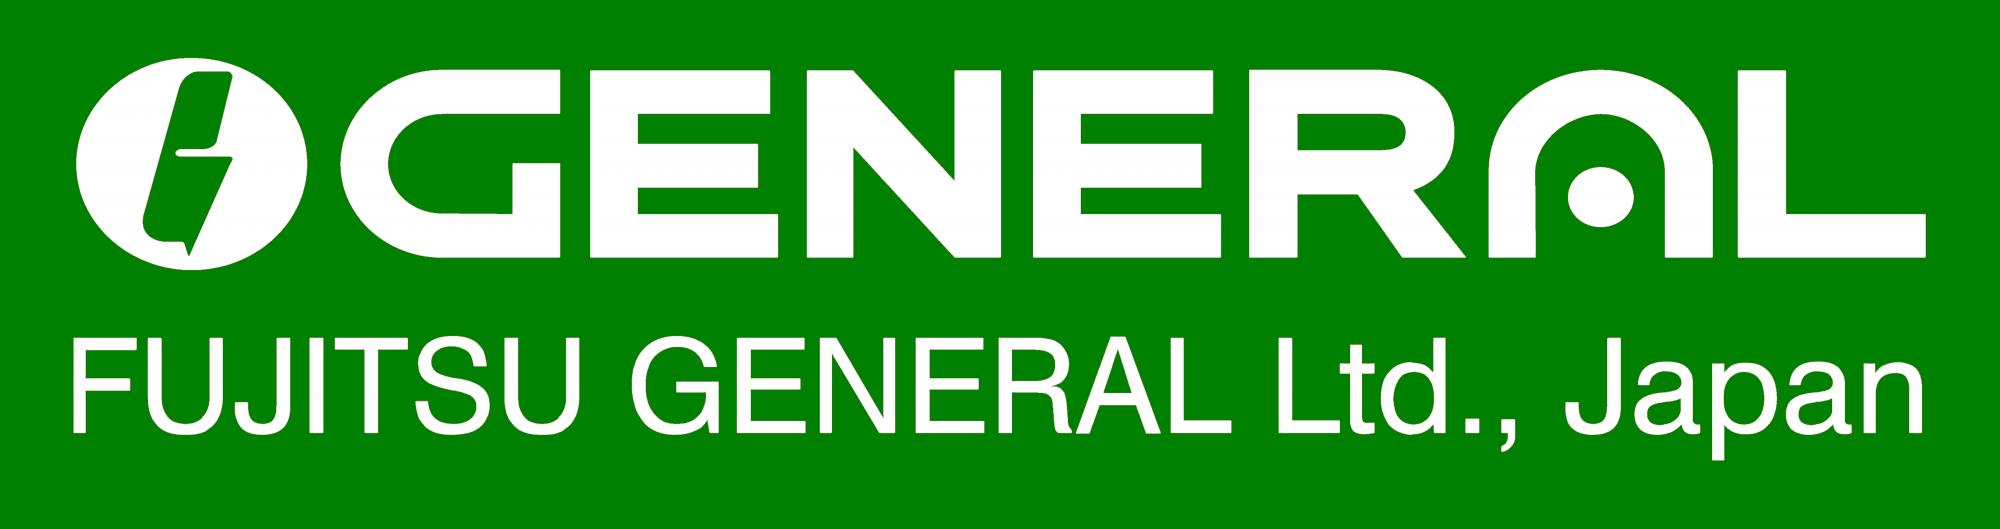 General – Fujitsu